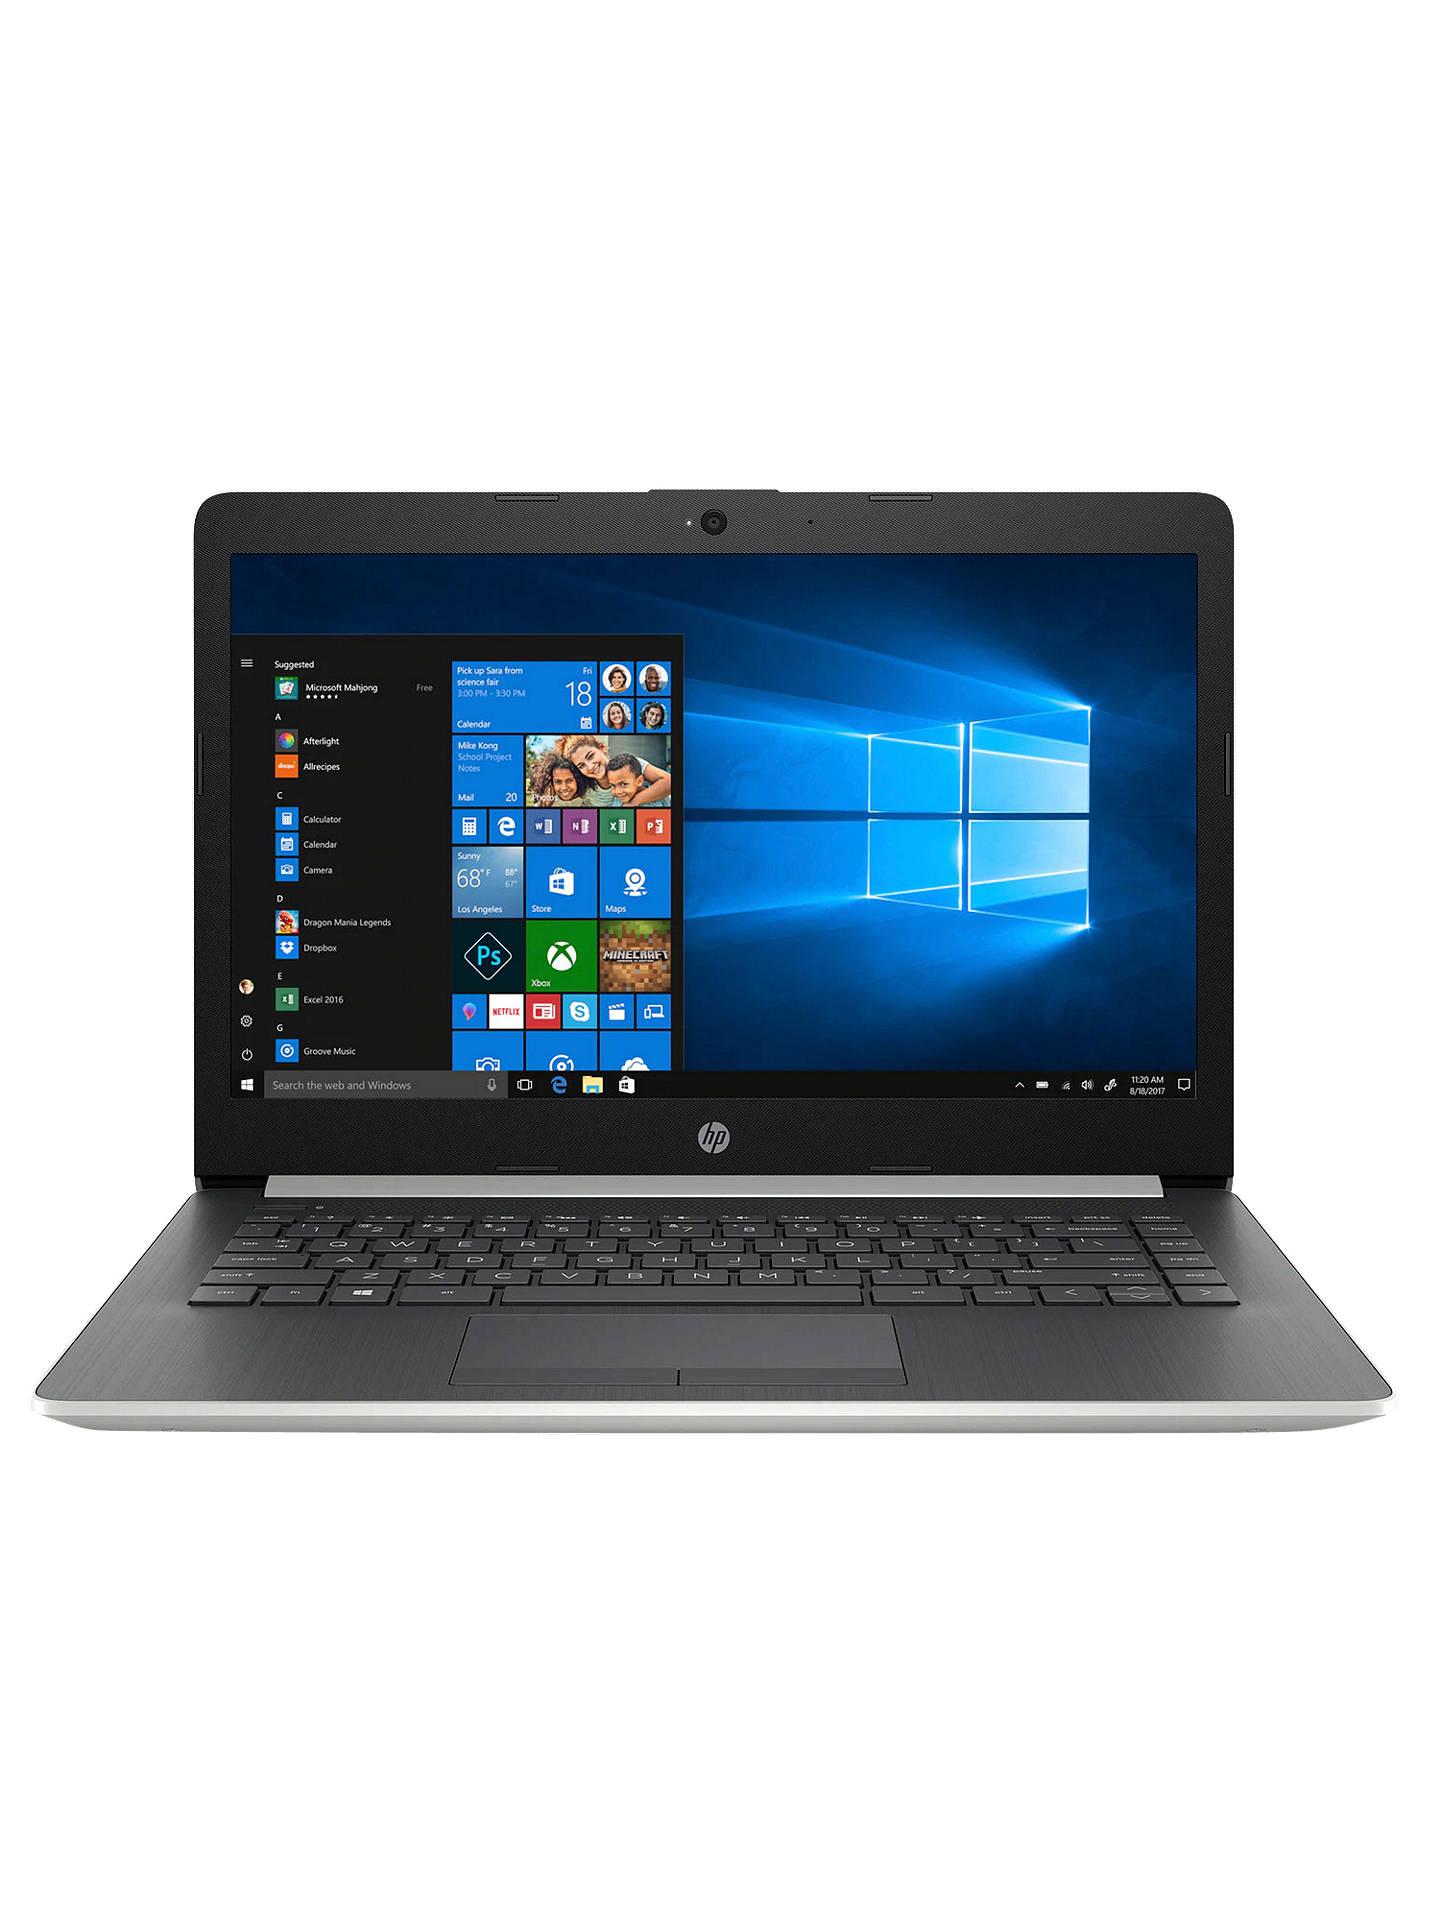 "HP 14-cm0011na Laptop, AMD Ryzen 5, 8GB RAM, 256GB SSD, 14"" Full HD"